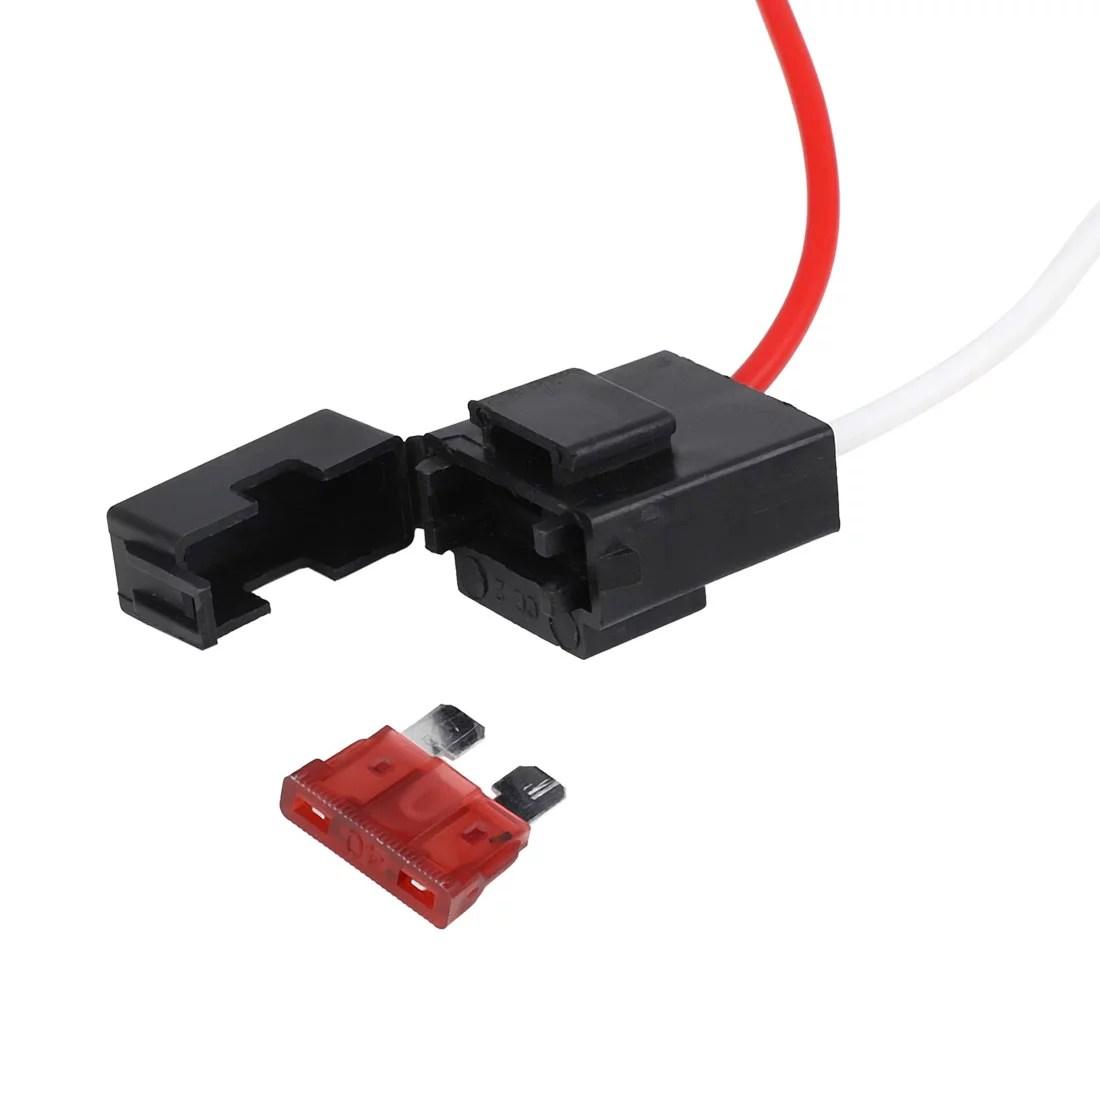 medium resolution of dc 12v car truck grille mount blast tone speaker wiring harness easy wiring harness kit car